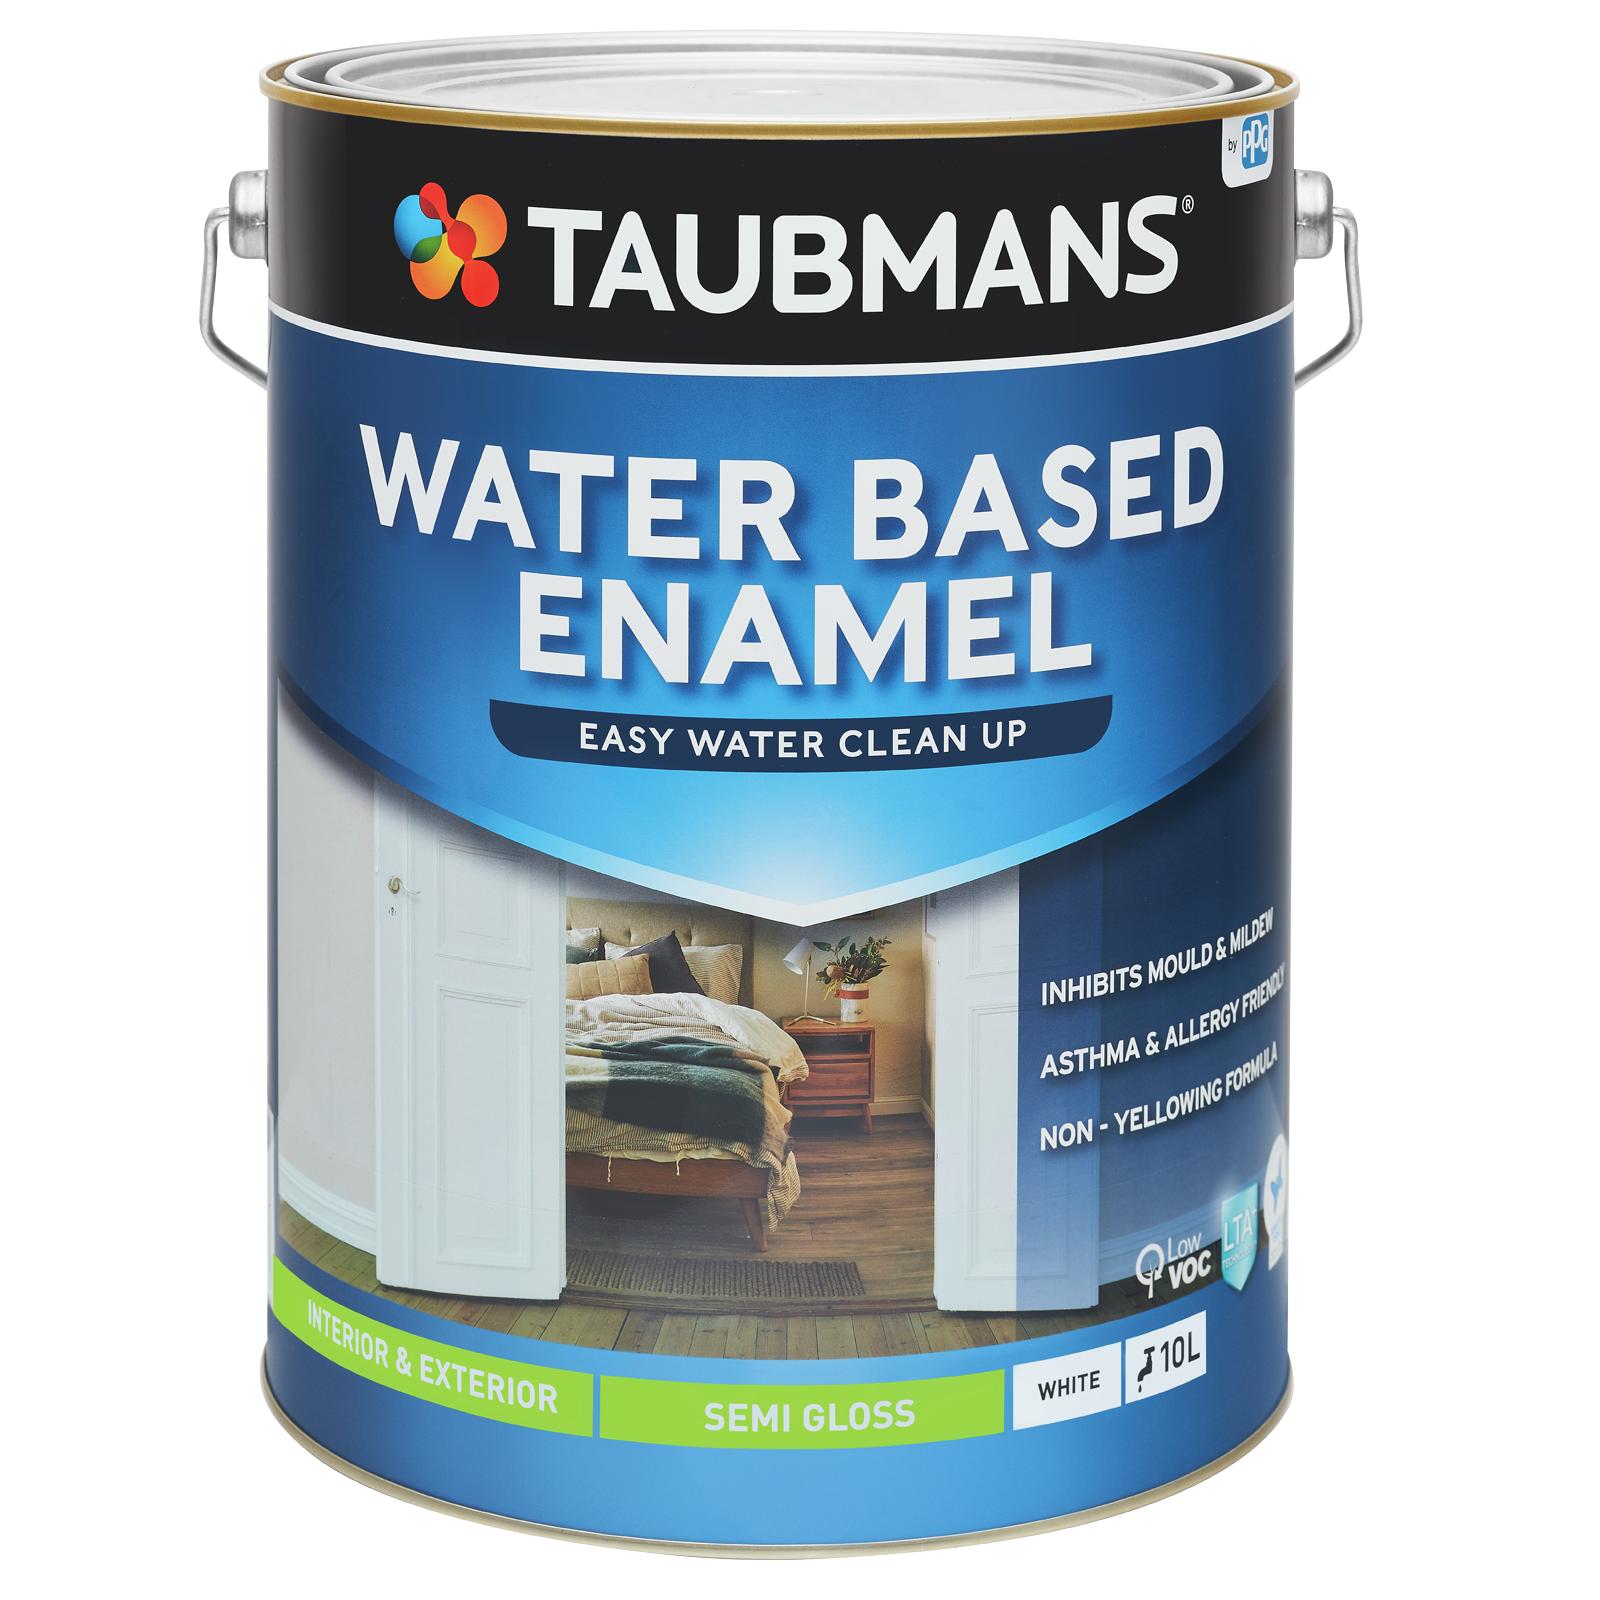 Taubmans 10L White Semi Gloss Water Based Enamel